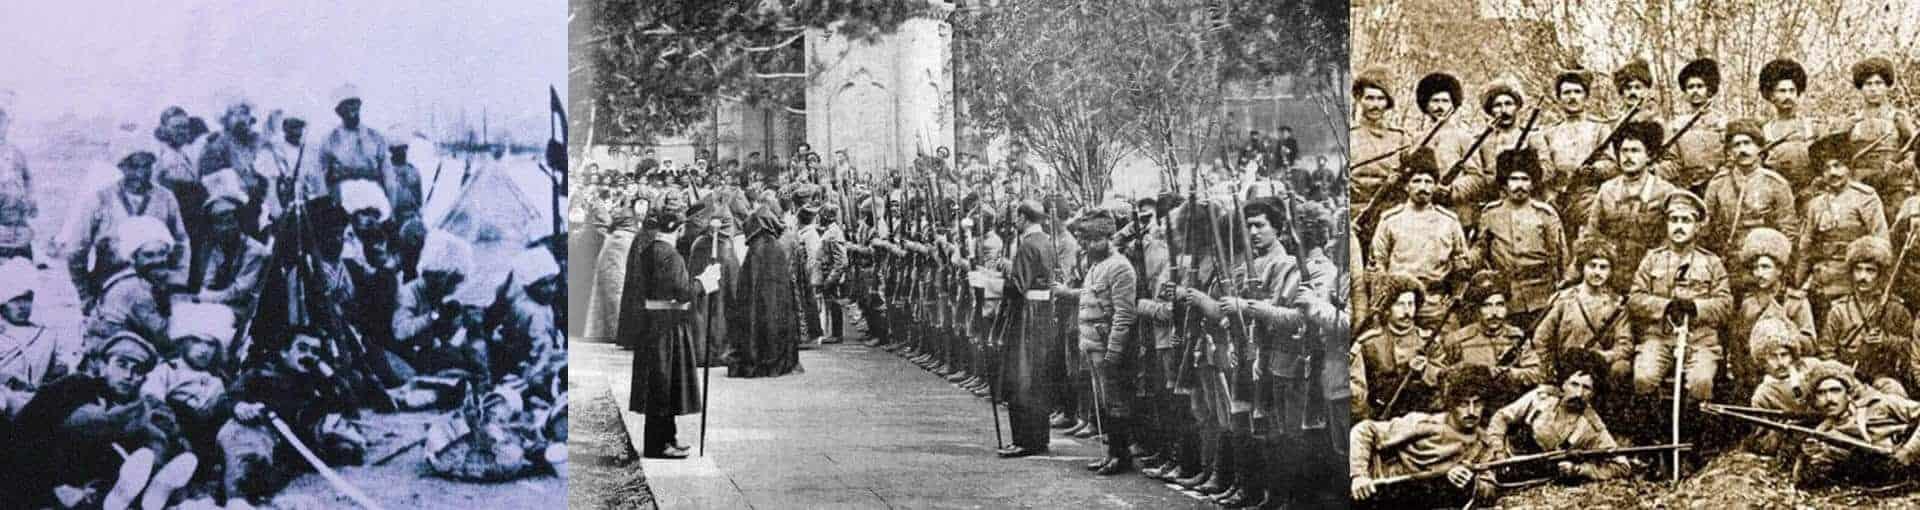 The First Republic of Armenia